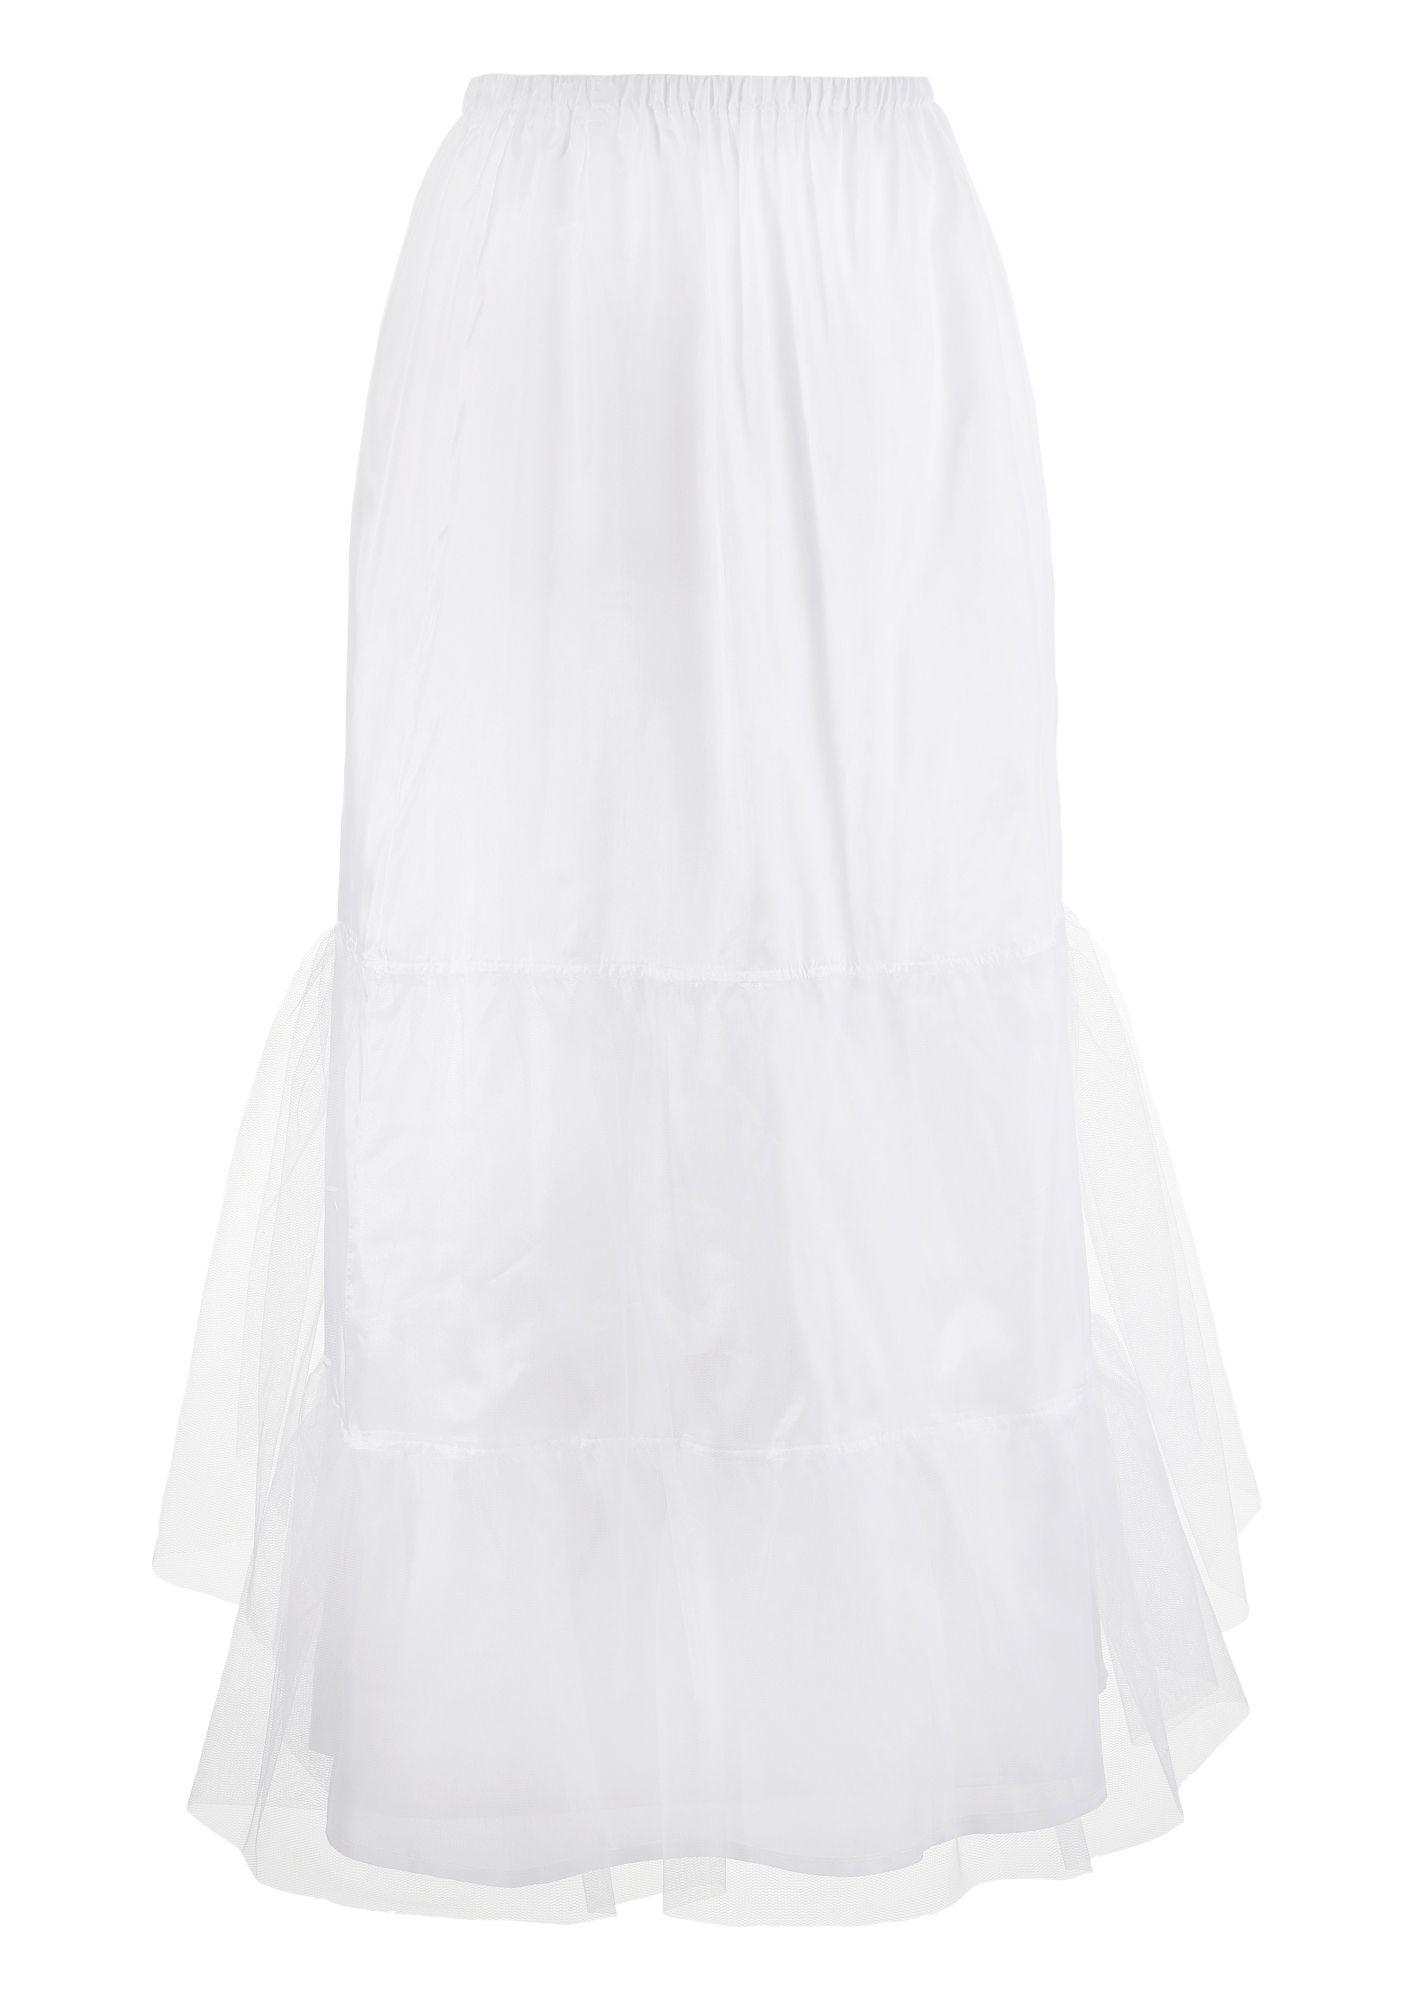 LOVE NATURE Love Nature Petticoat mit praktischen Gummizug